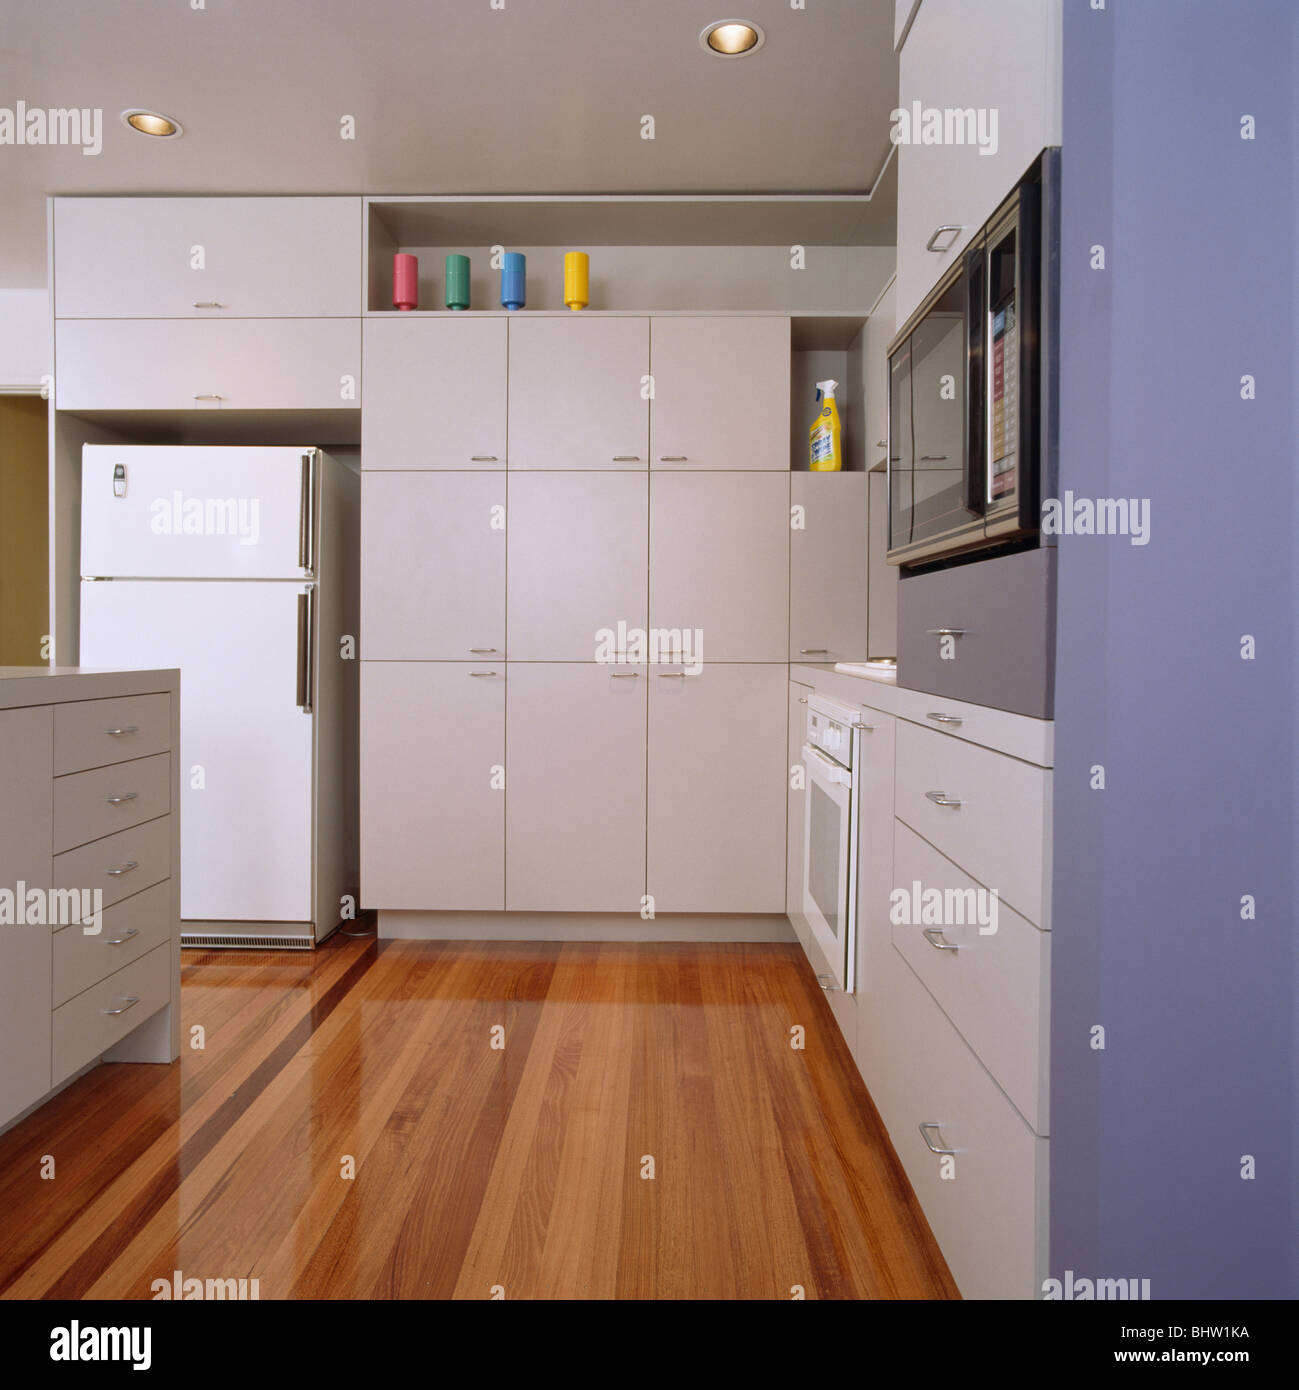 interiors modern kitchens fridge freezers stockfotos. Black Bedroom Furniture Sets. Home Design Ideas